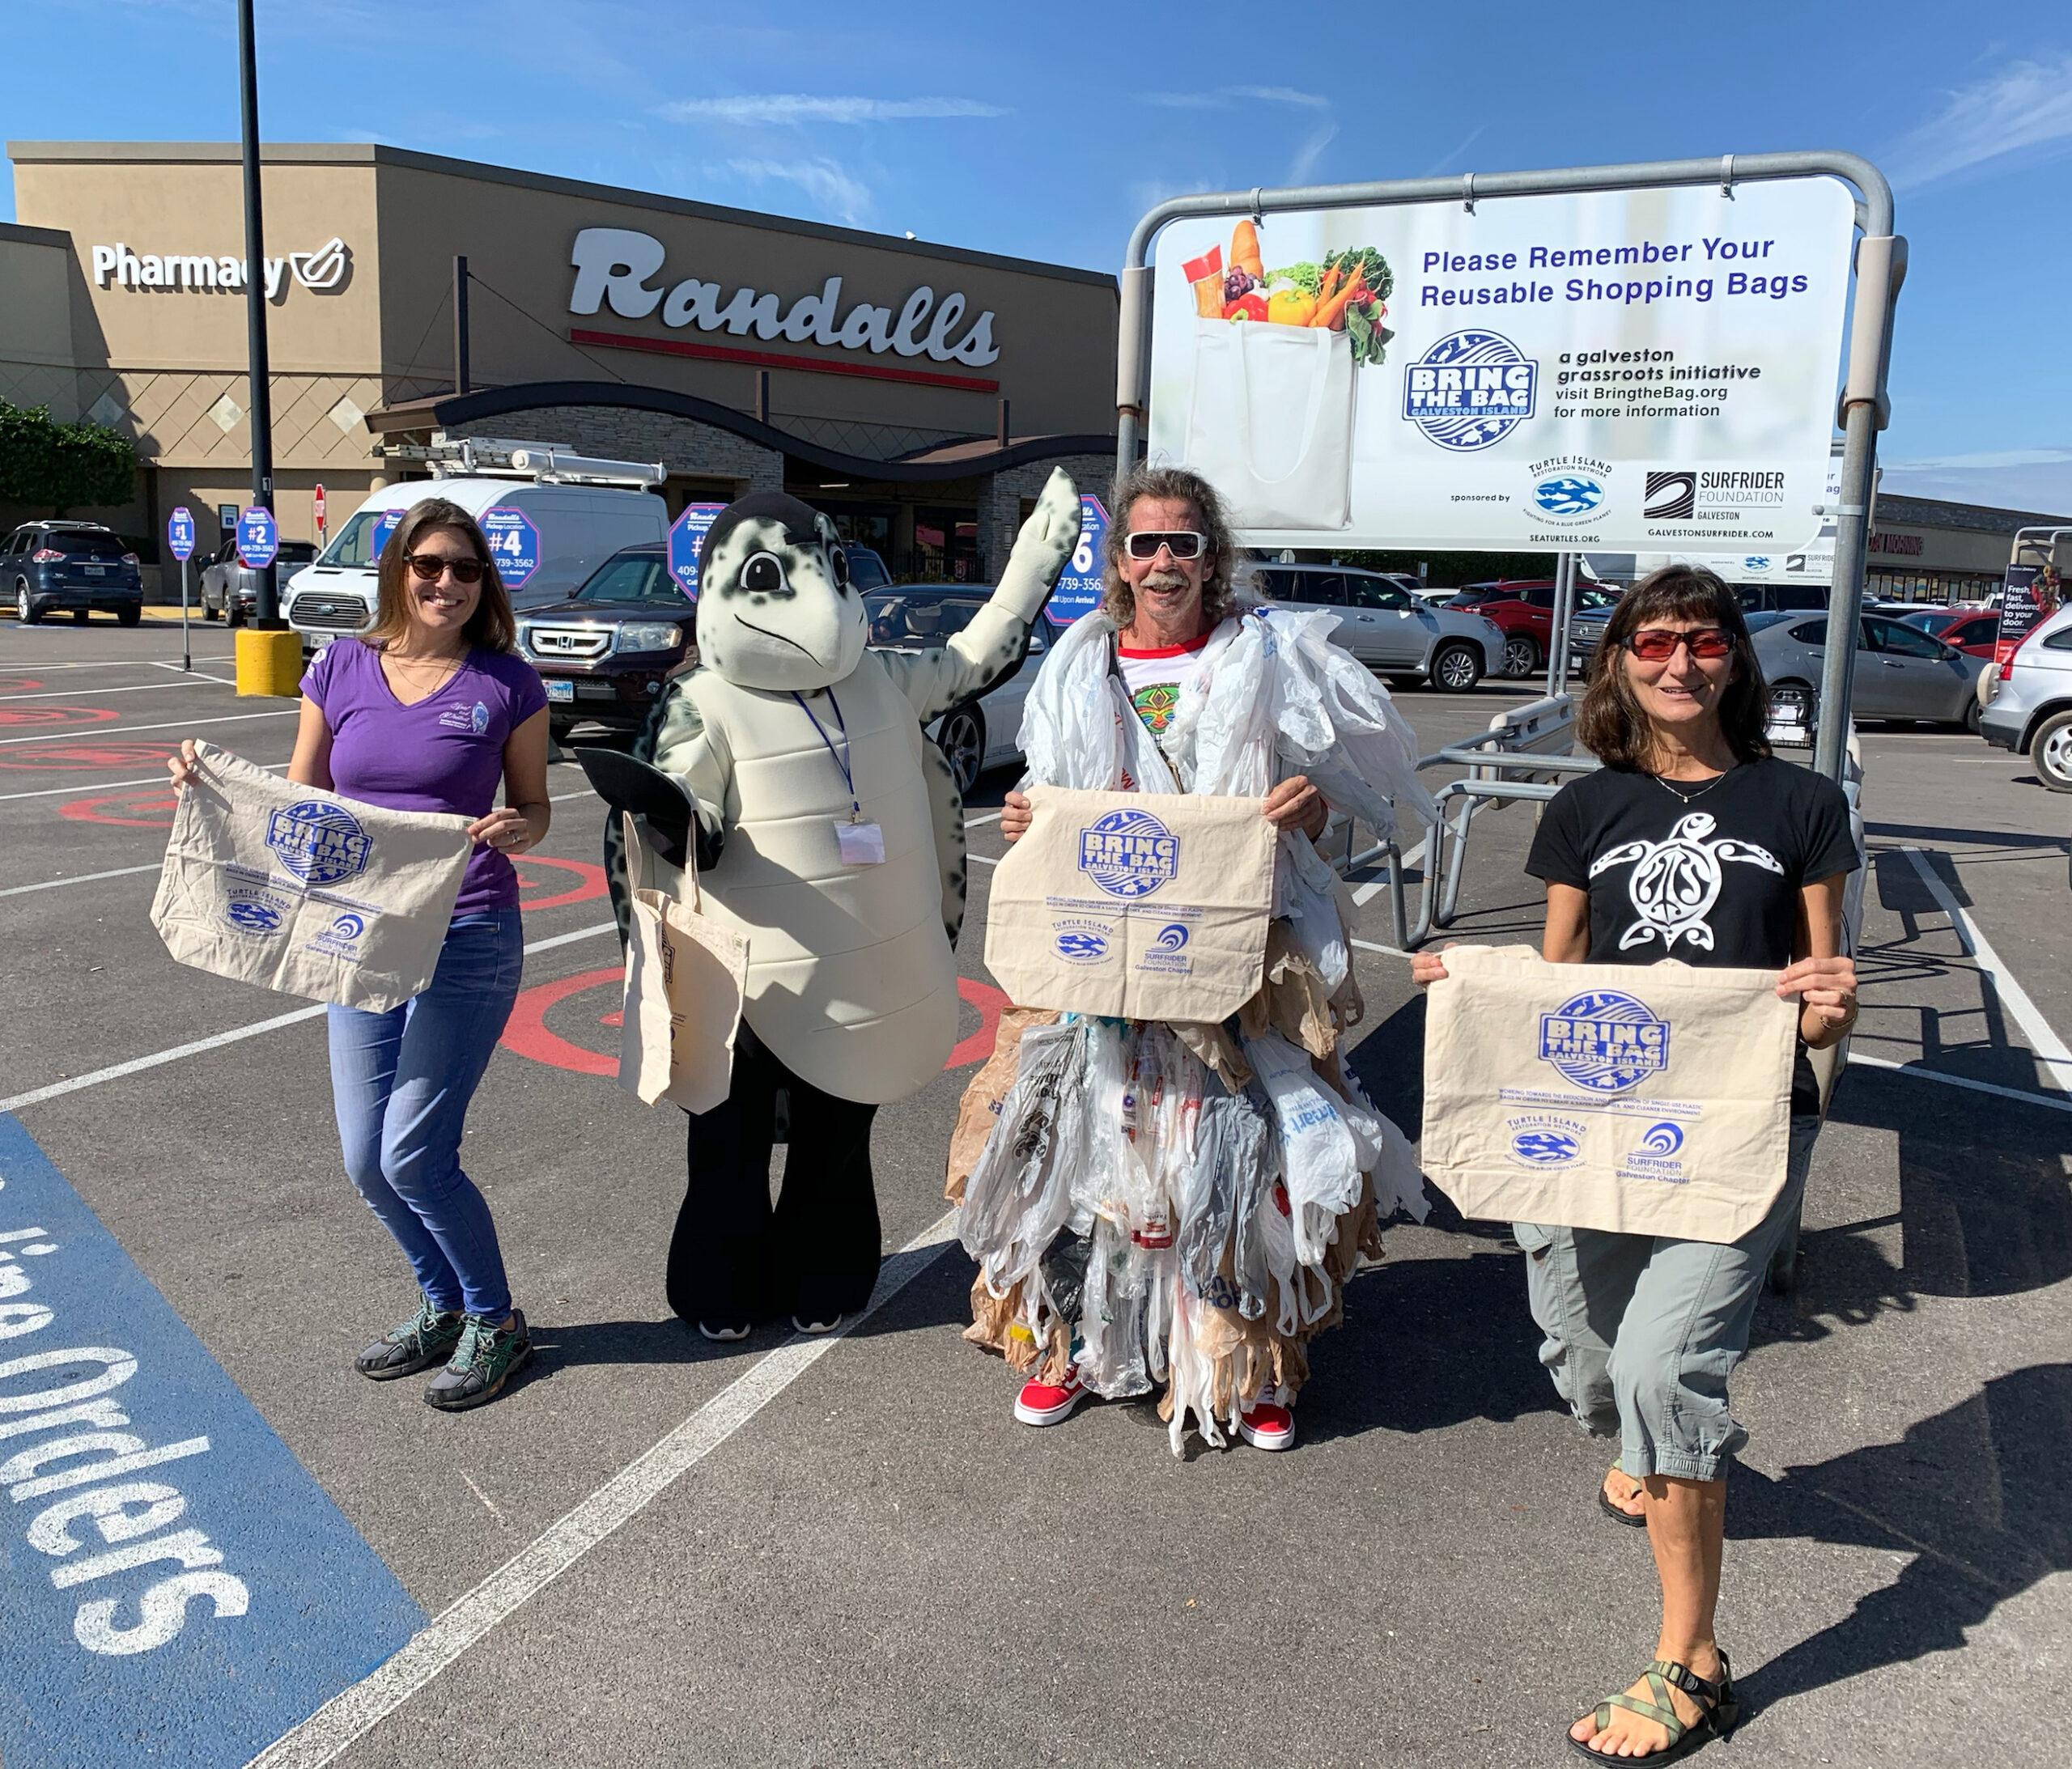 Environmental Groups Renew Push for Single-Use Plastic Bag Ban in Galveston